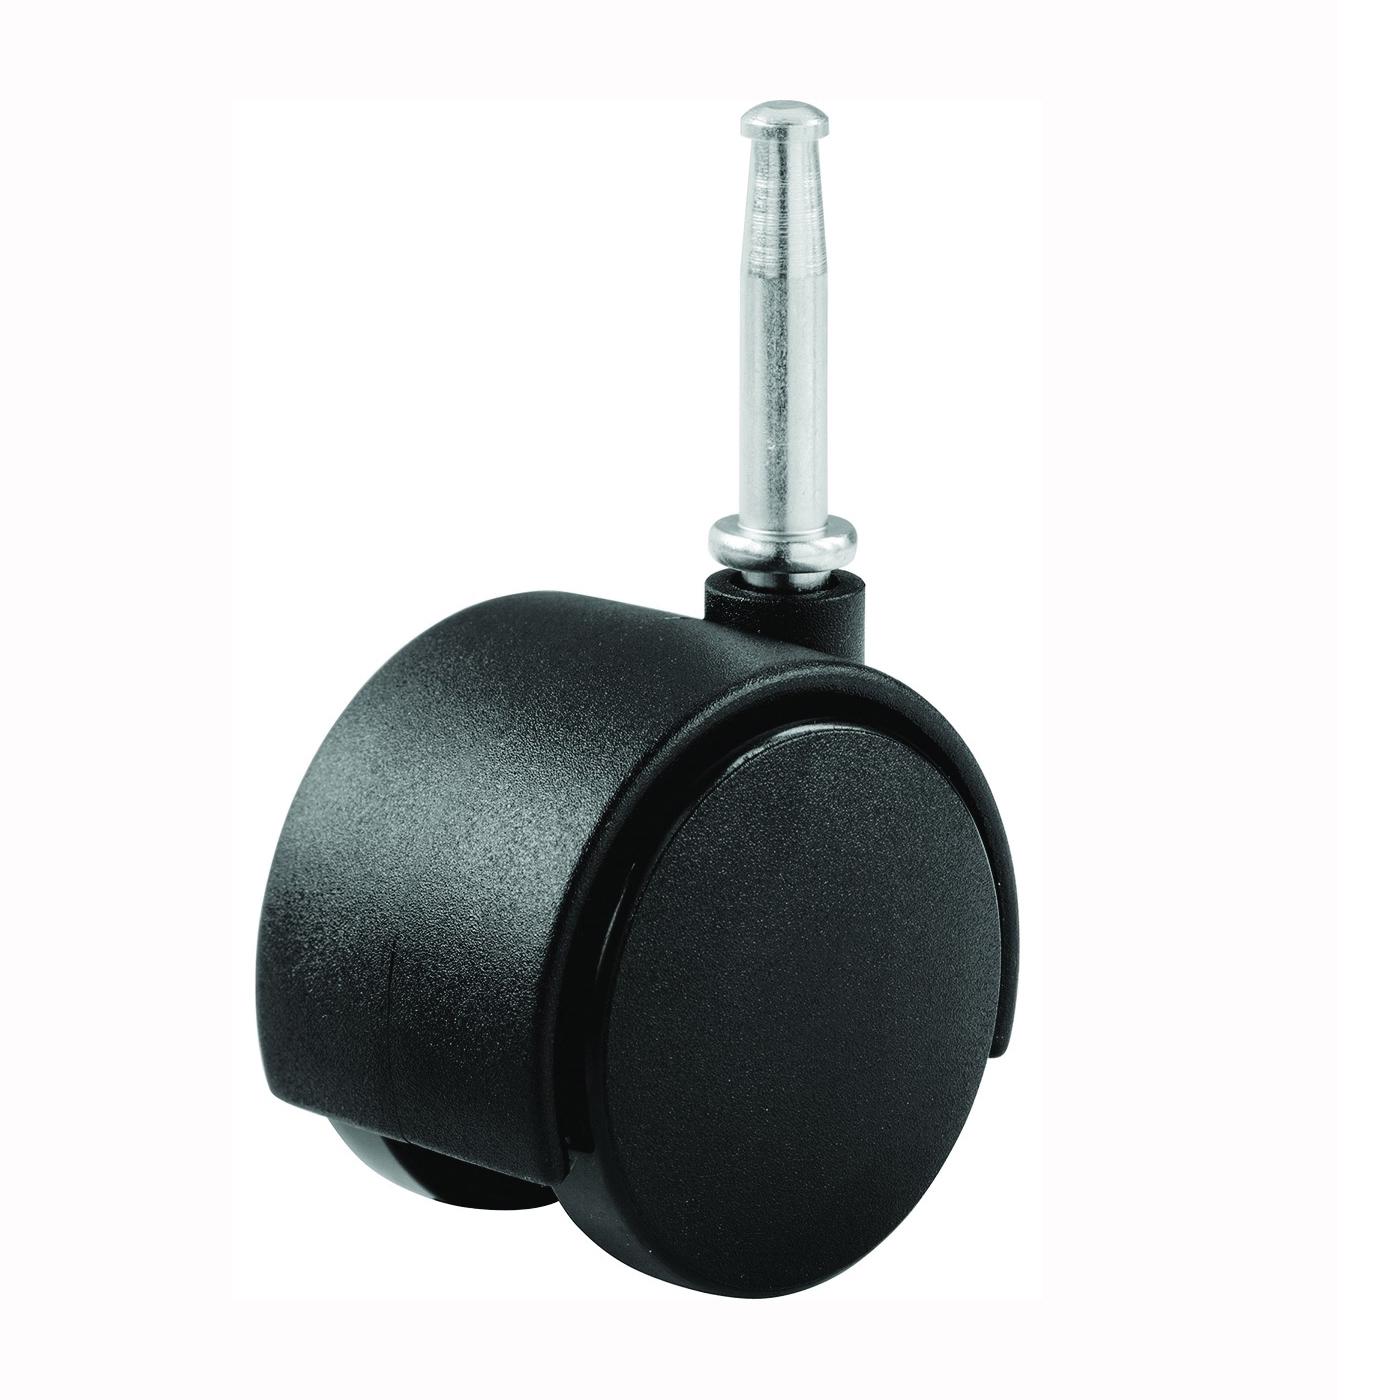 Picture of Shepherd Hardware 9402 Swivel Caster, 1-5/8 in Dia Wheel, Nylon Wheel, Black, 40 lb